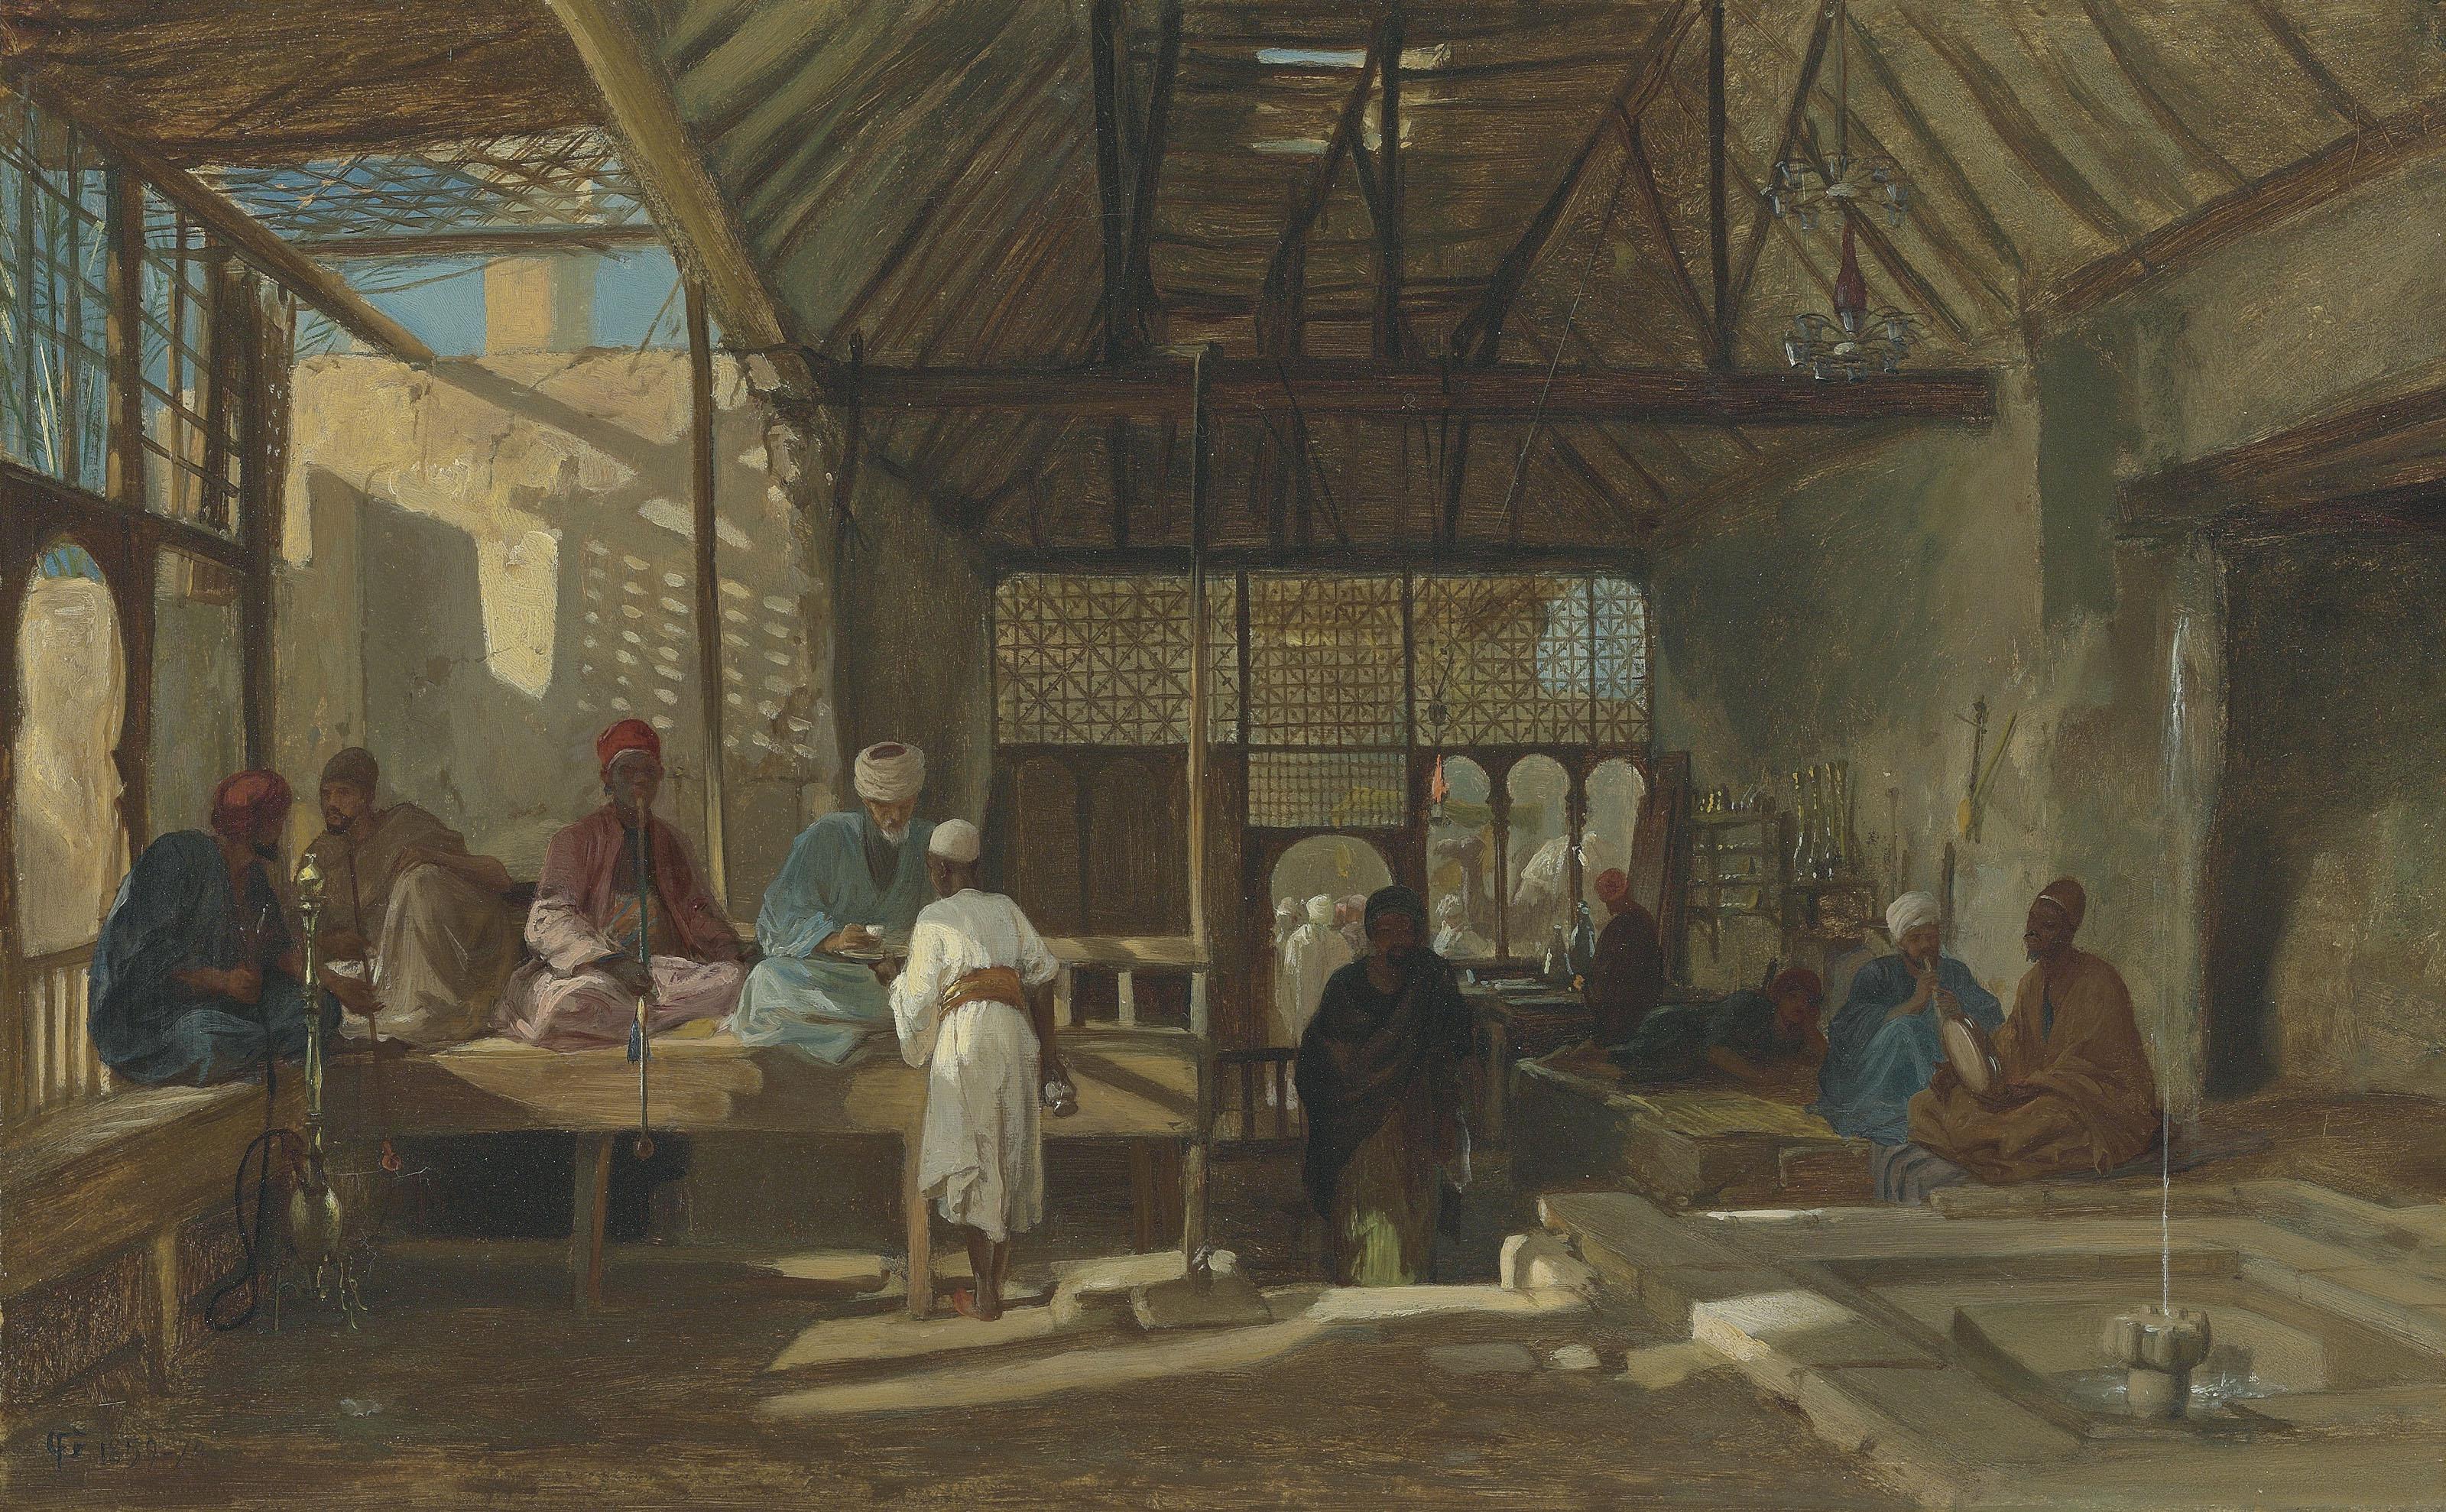 Frederick Goodall (British, 1822-1904)